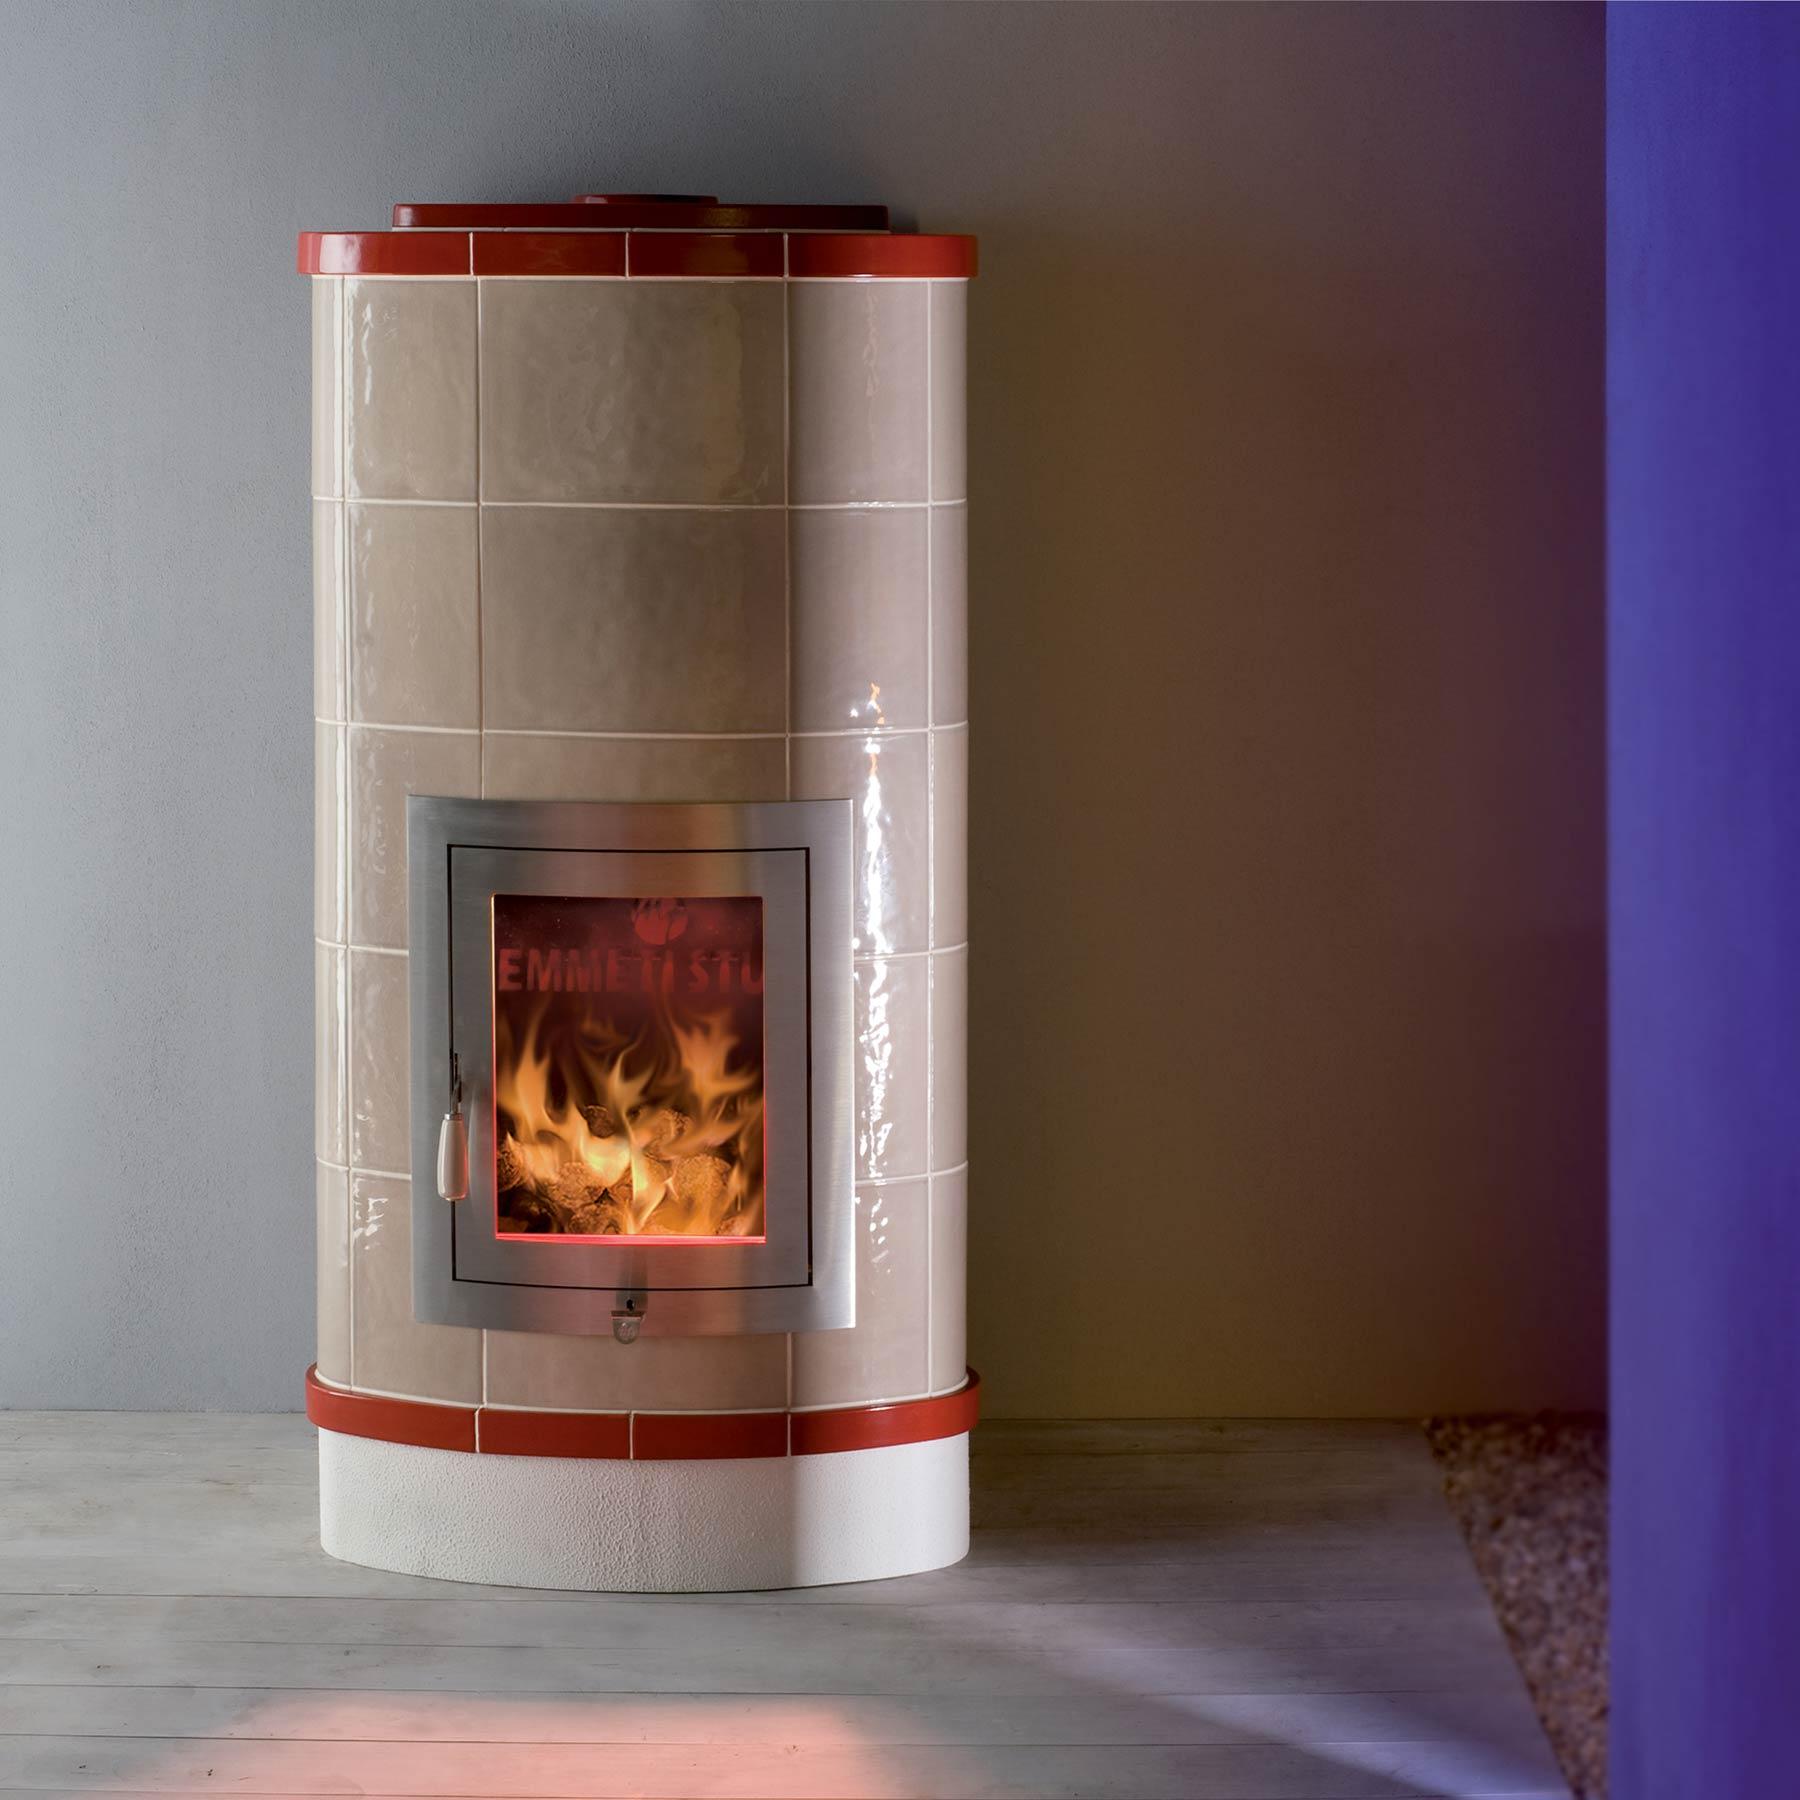 Stufa a legna contemporanea priscilla mt design stufe - Stufe a legna ventilate ...